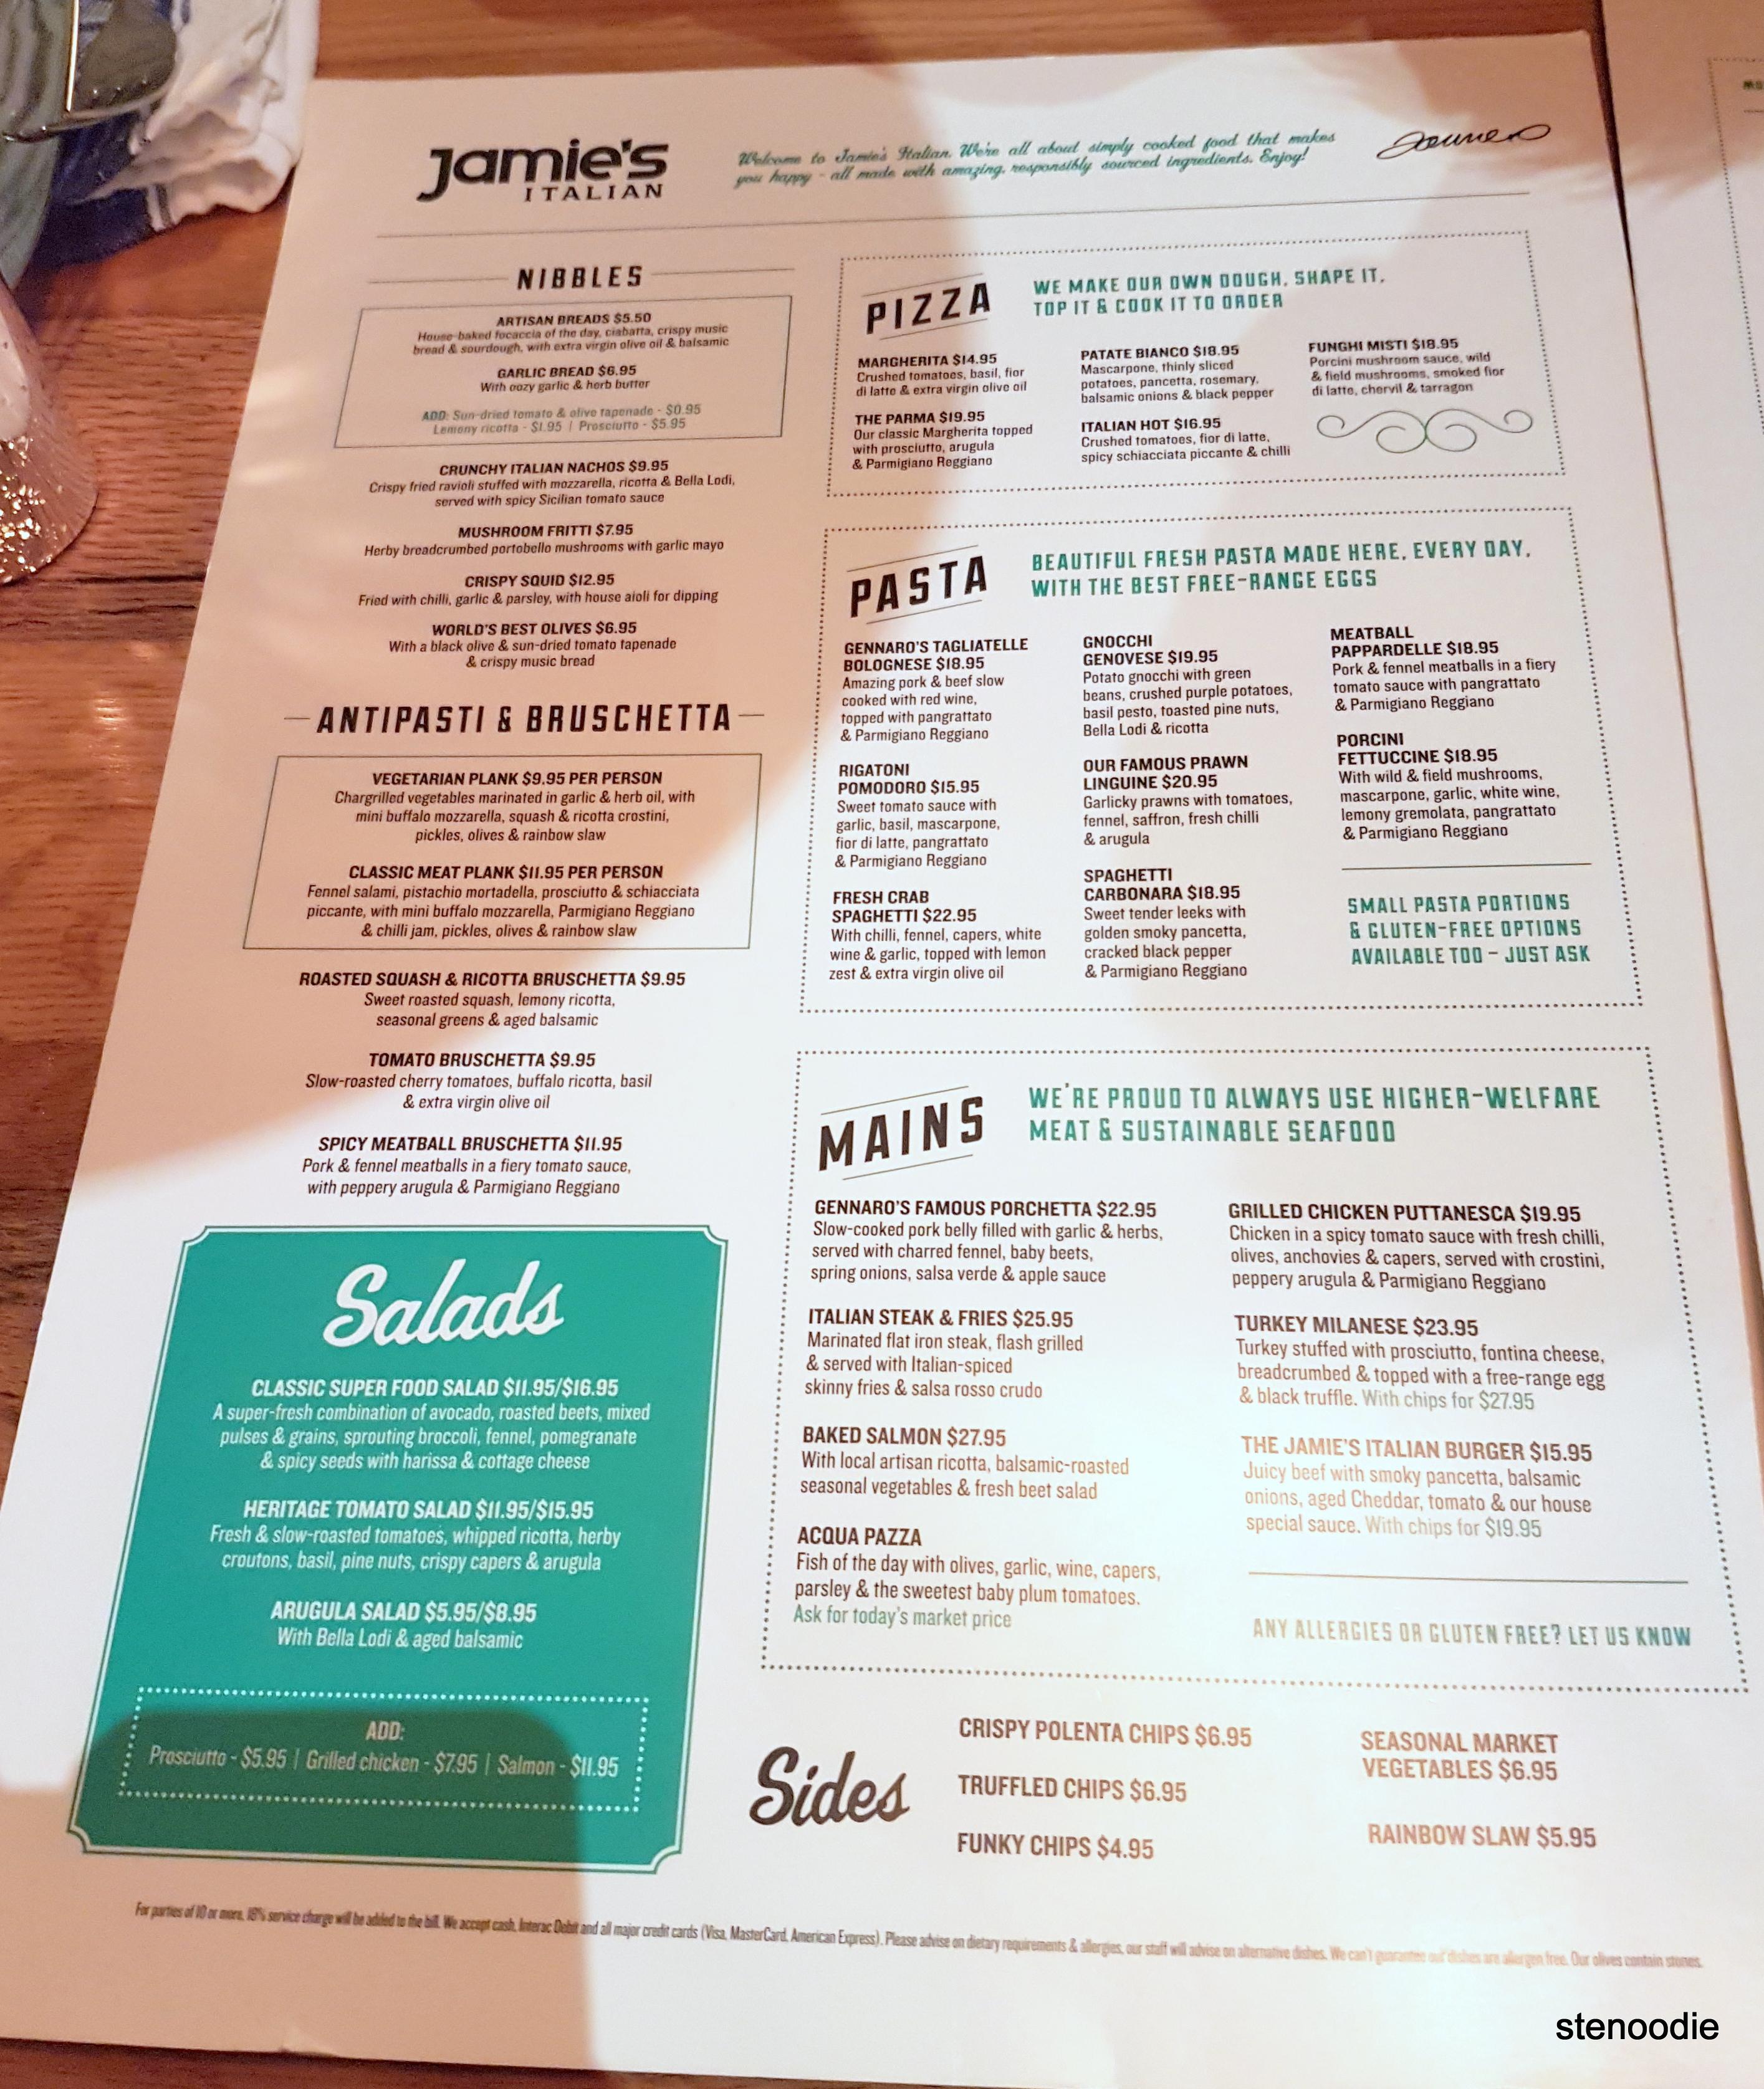 Jamie's Italian Yorkdale dinner menu